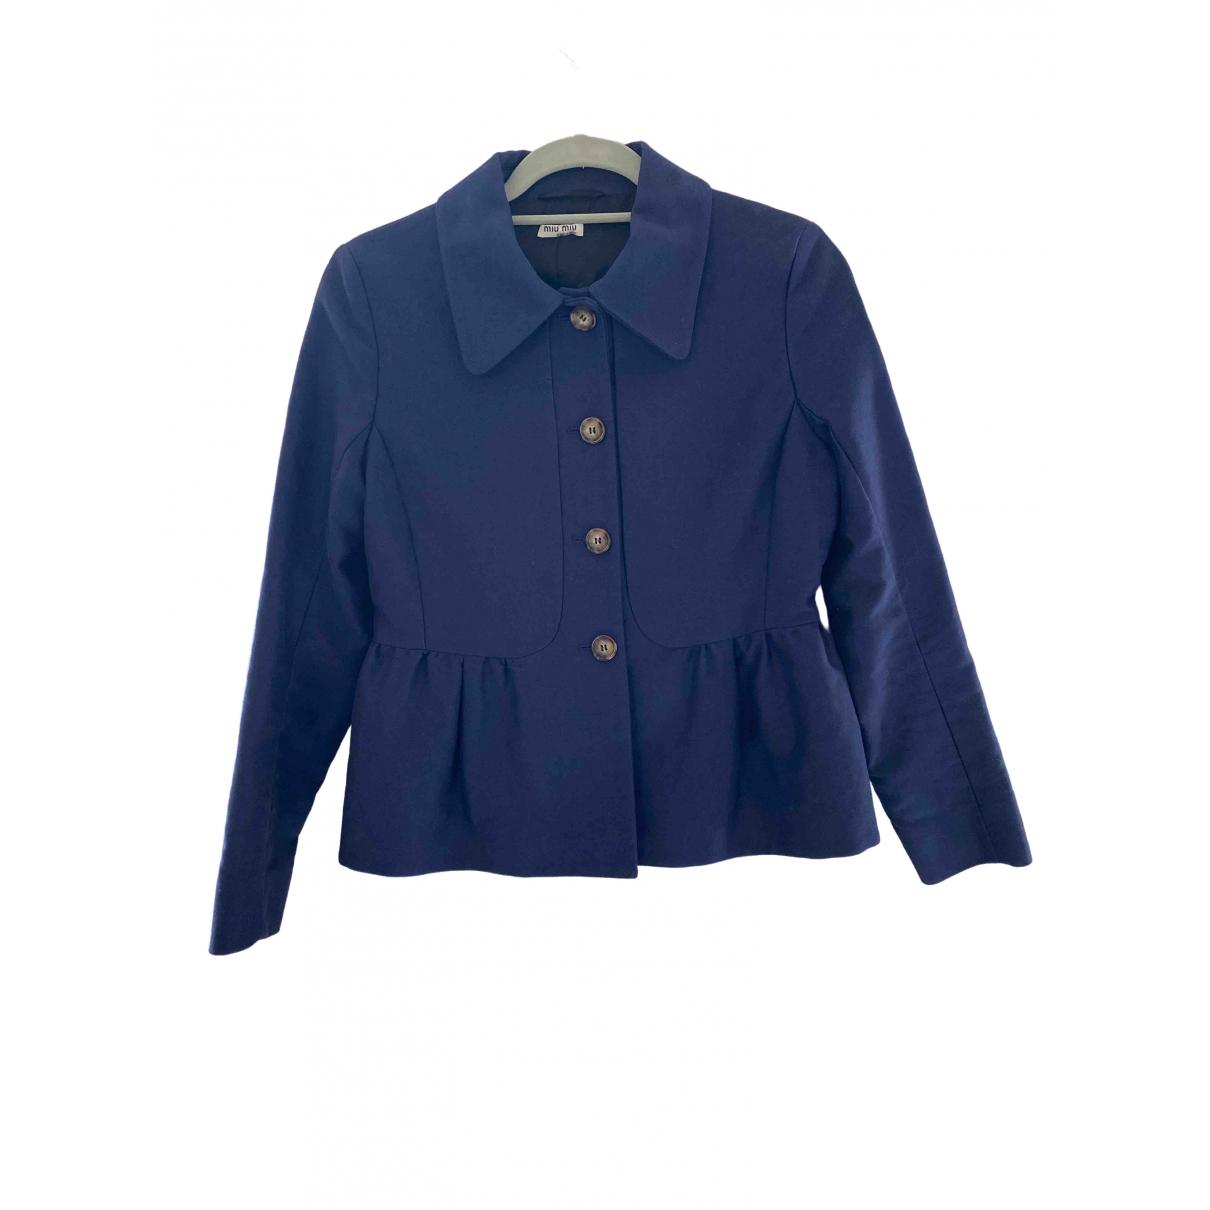 Miu Miu \N Blue Cotton jacket for Women 42 IT